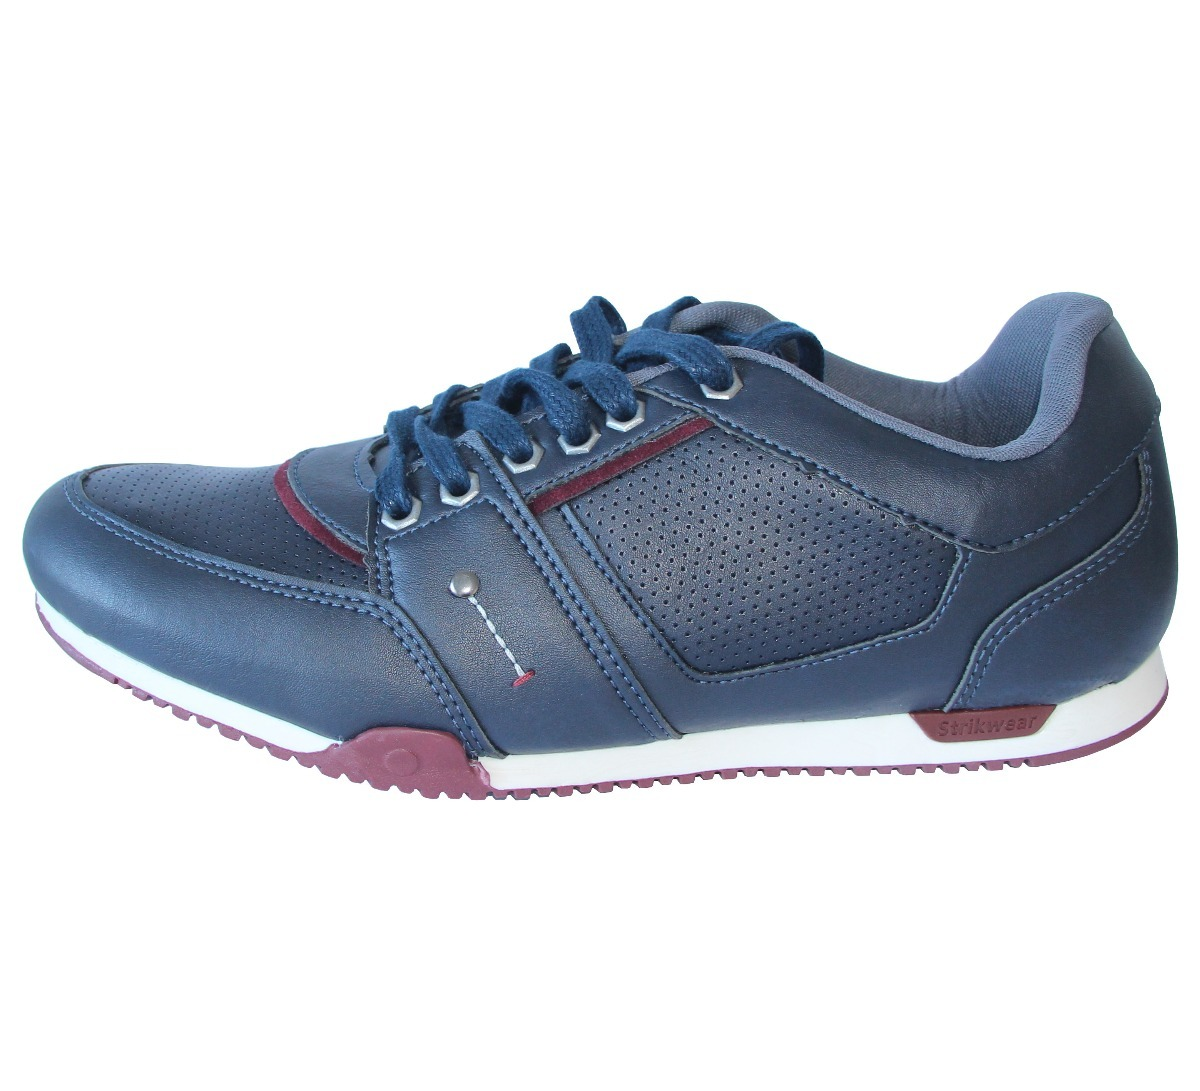 94c30cdb81 sapatênis masculino couro sintético azul barato. Carregando zoom.